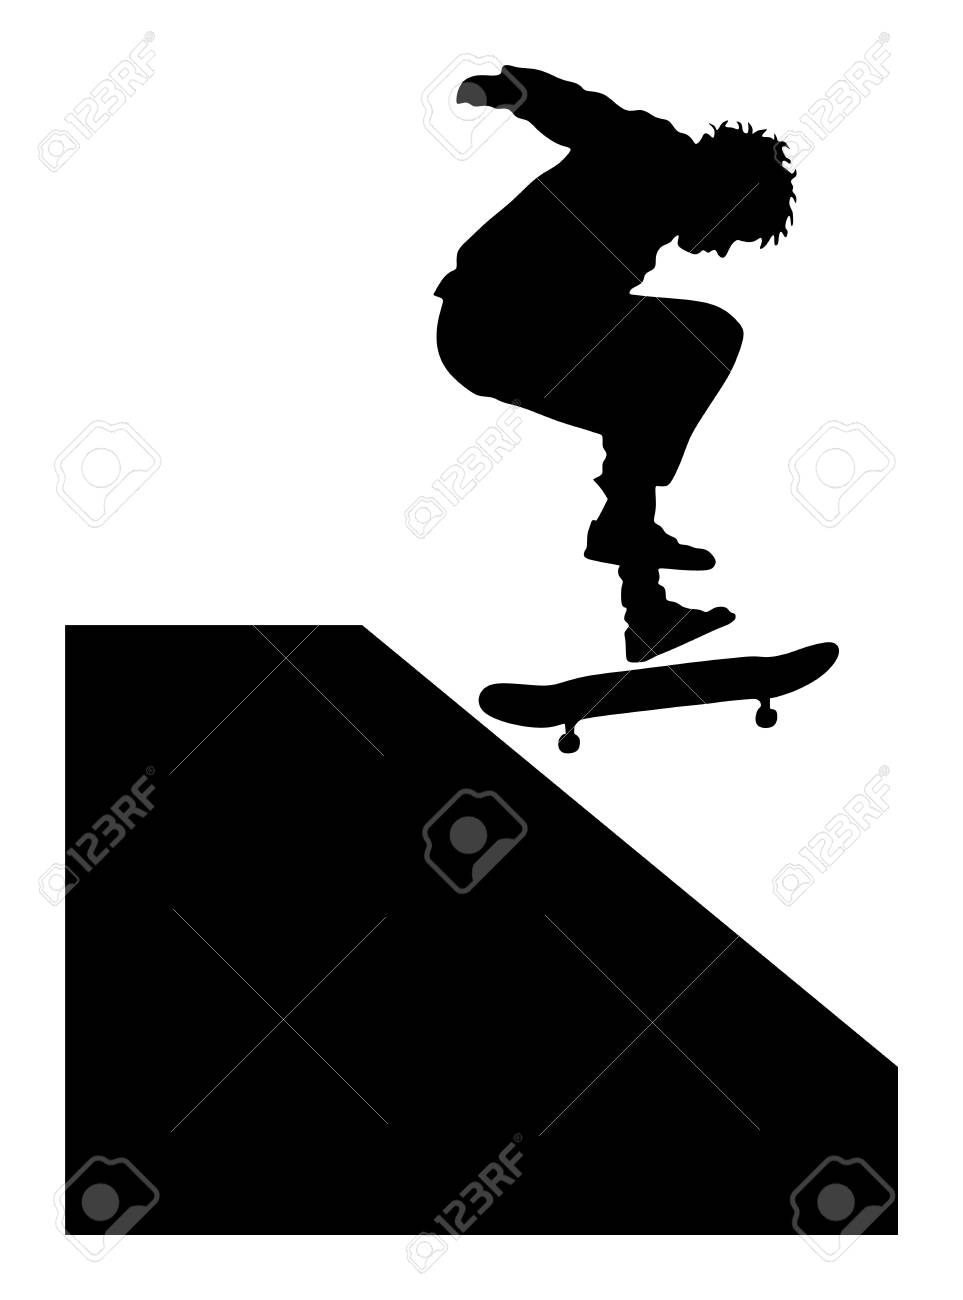 Skatepark Wallpapers - Top Free Skatepark Backgrounds - WallpaperAccess